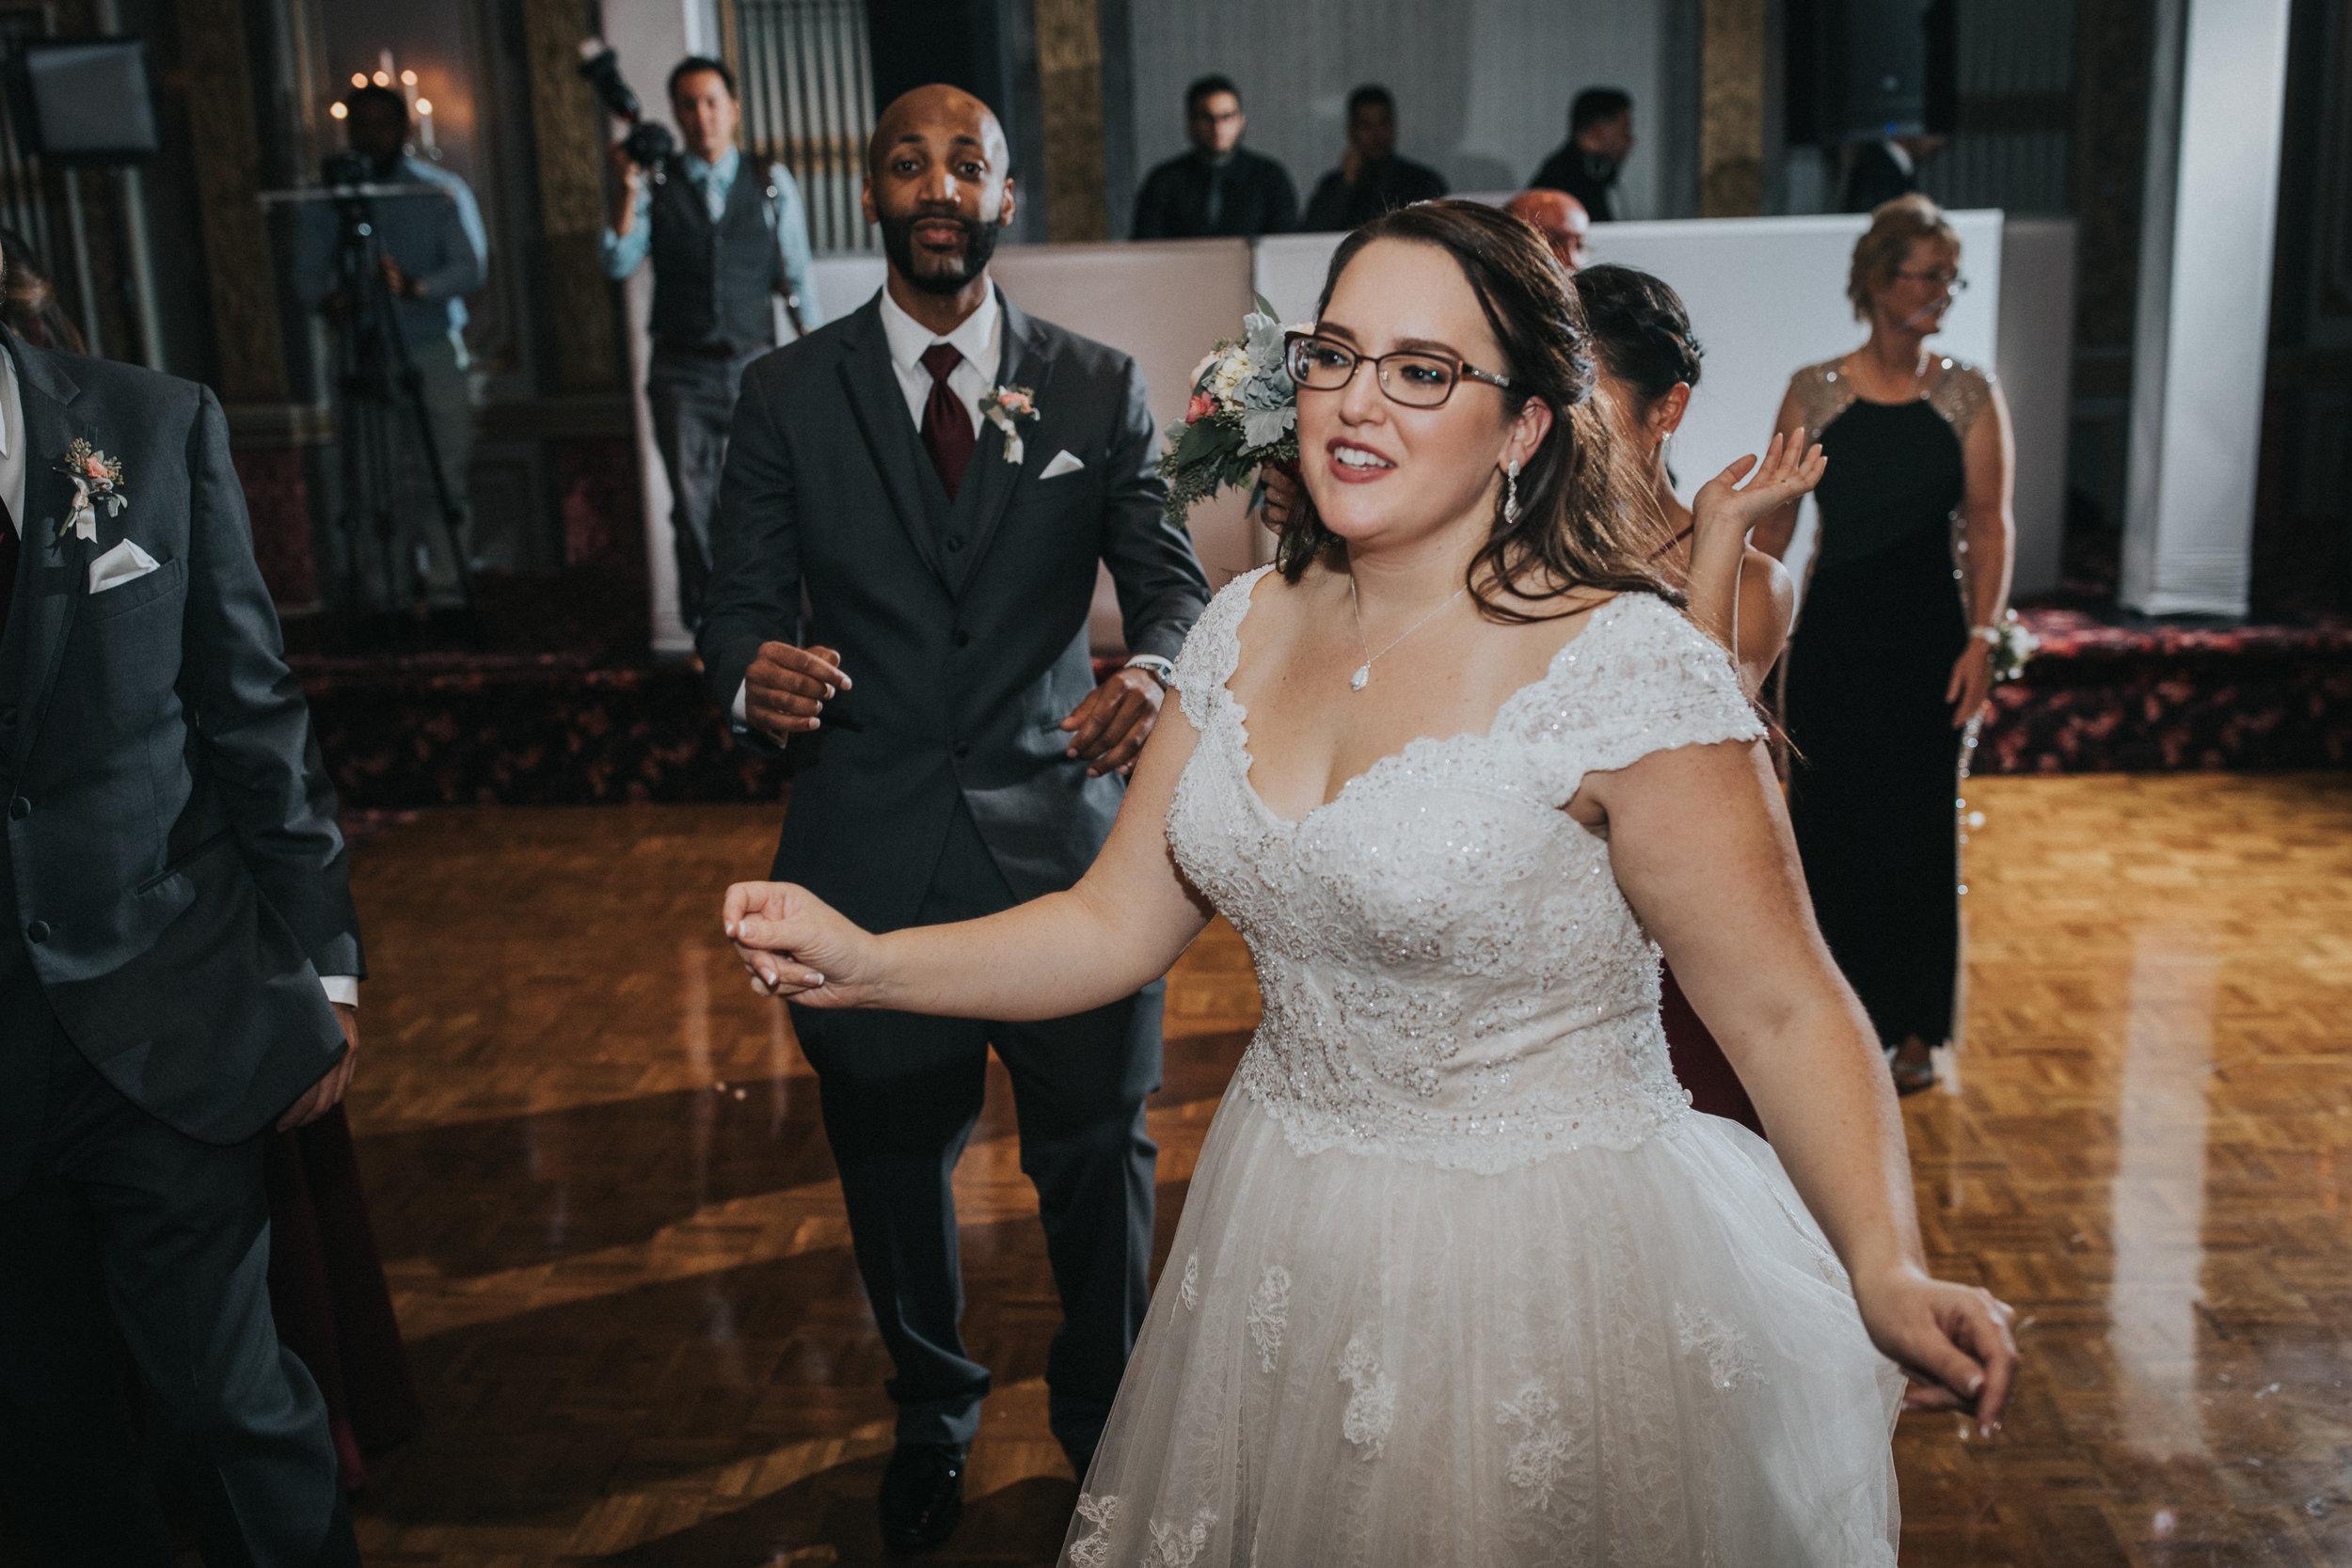 New-Jersey-Wedding-Photography-Fishers-Tudor-House-JennaLynnPhotography-Reception-Kathleen&Eddie-46.jpg